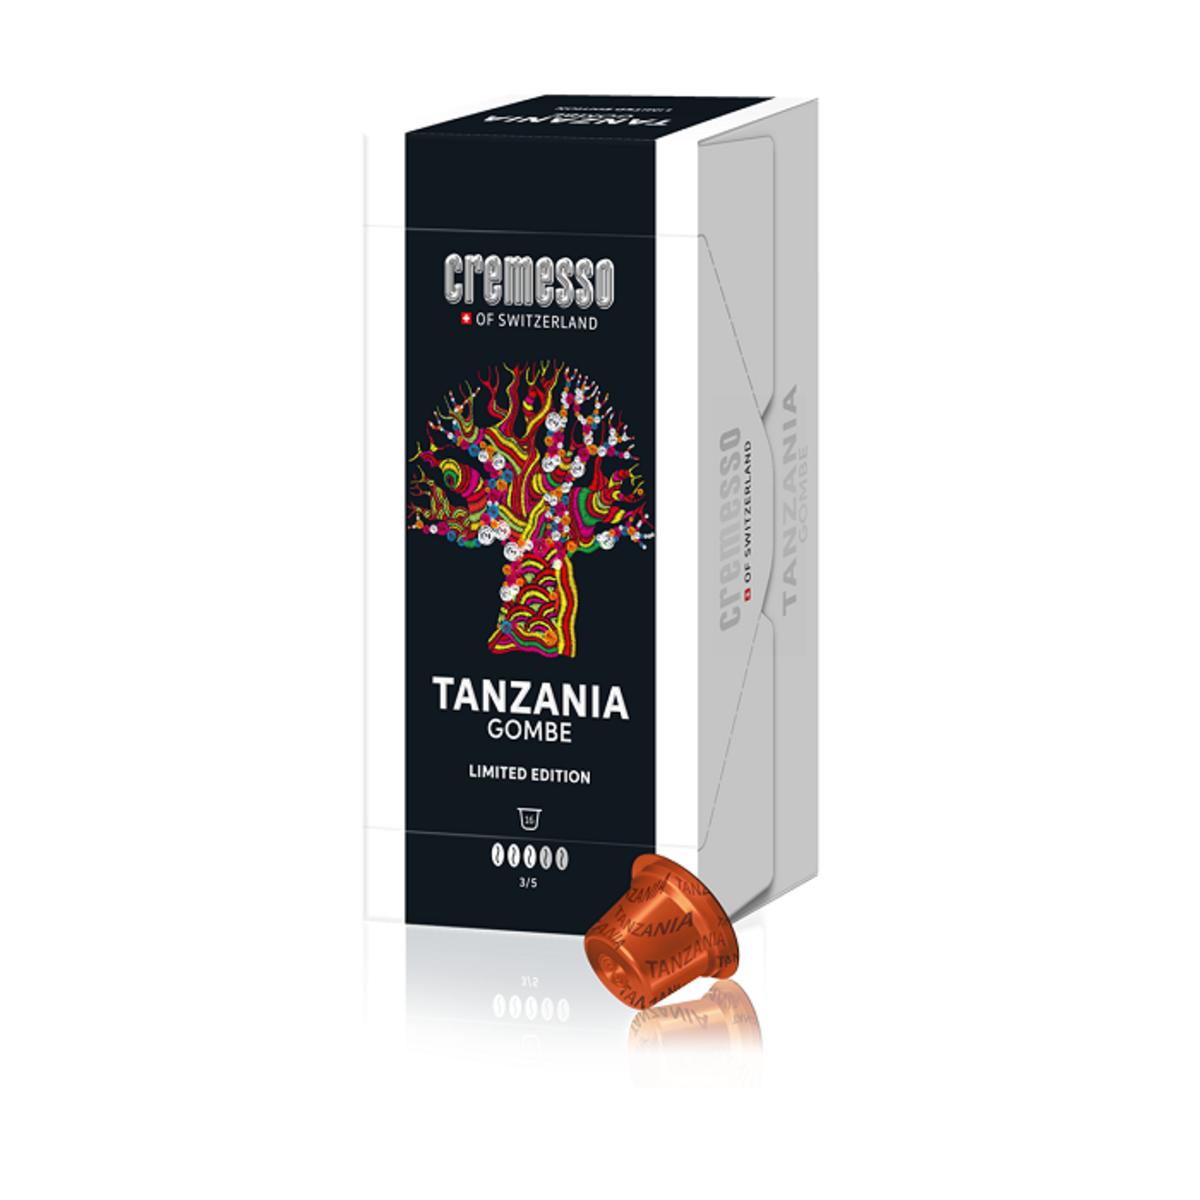 Cremesso Tanzania Gombe 16бр капсули